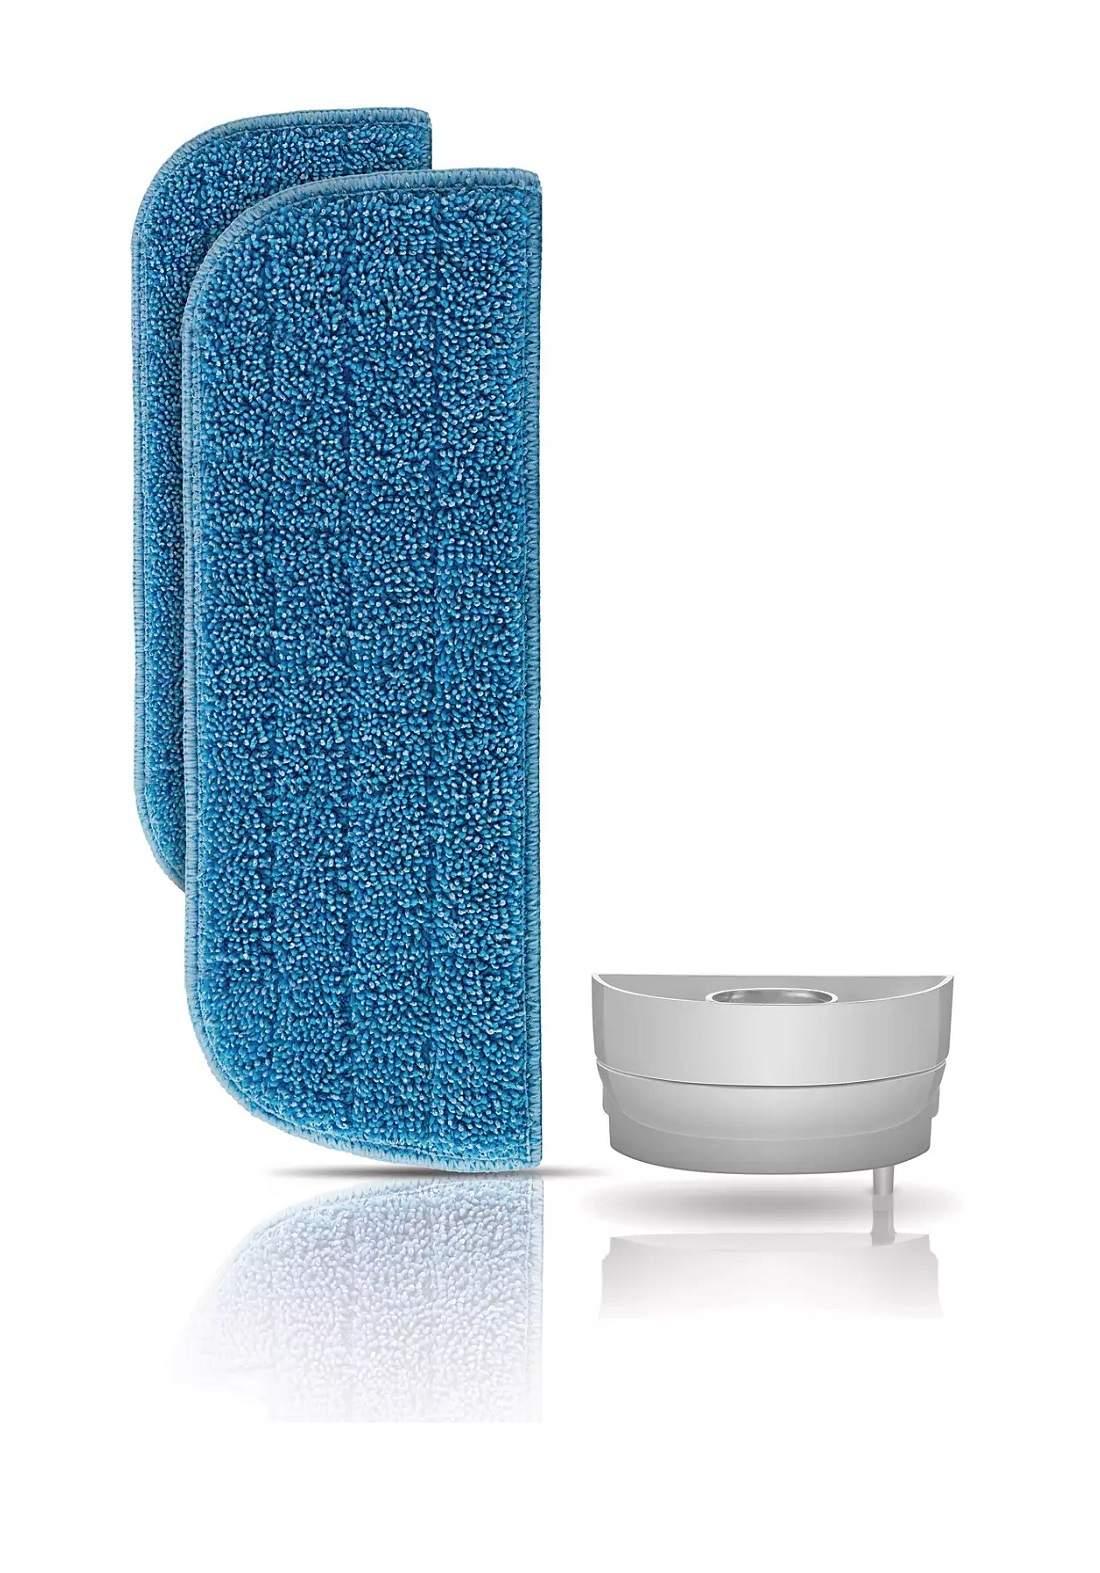 Philips Fc8056 Two Washable Micro-Fiber Brushes Active Calc Filter  فرشتان من الألياف الدقيقة المكنسة البخارية